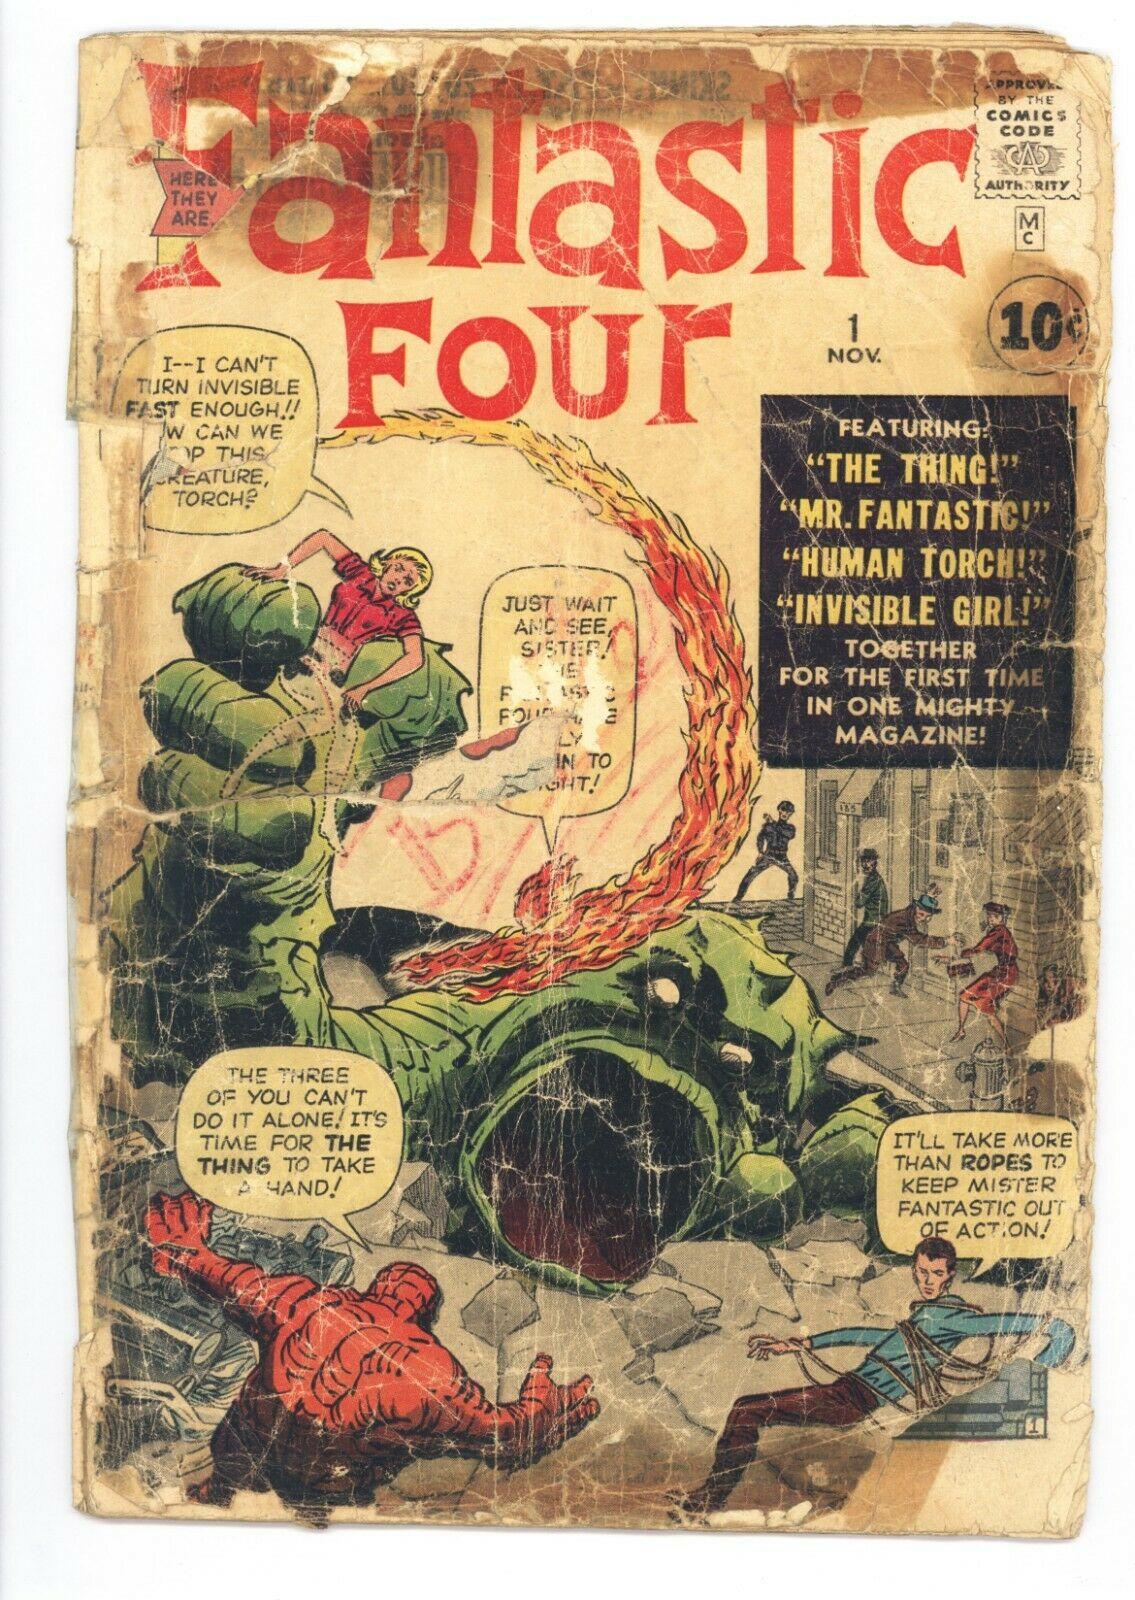 Fantastic Four #1 Original 1961 Low Grade 1st App of the Fantastic Four